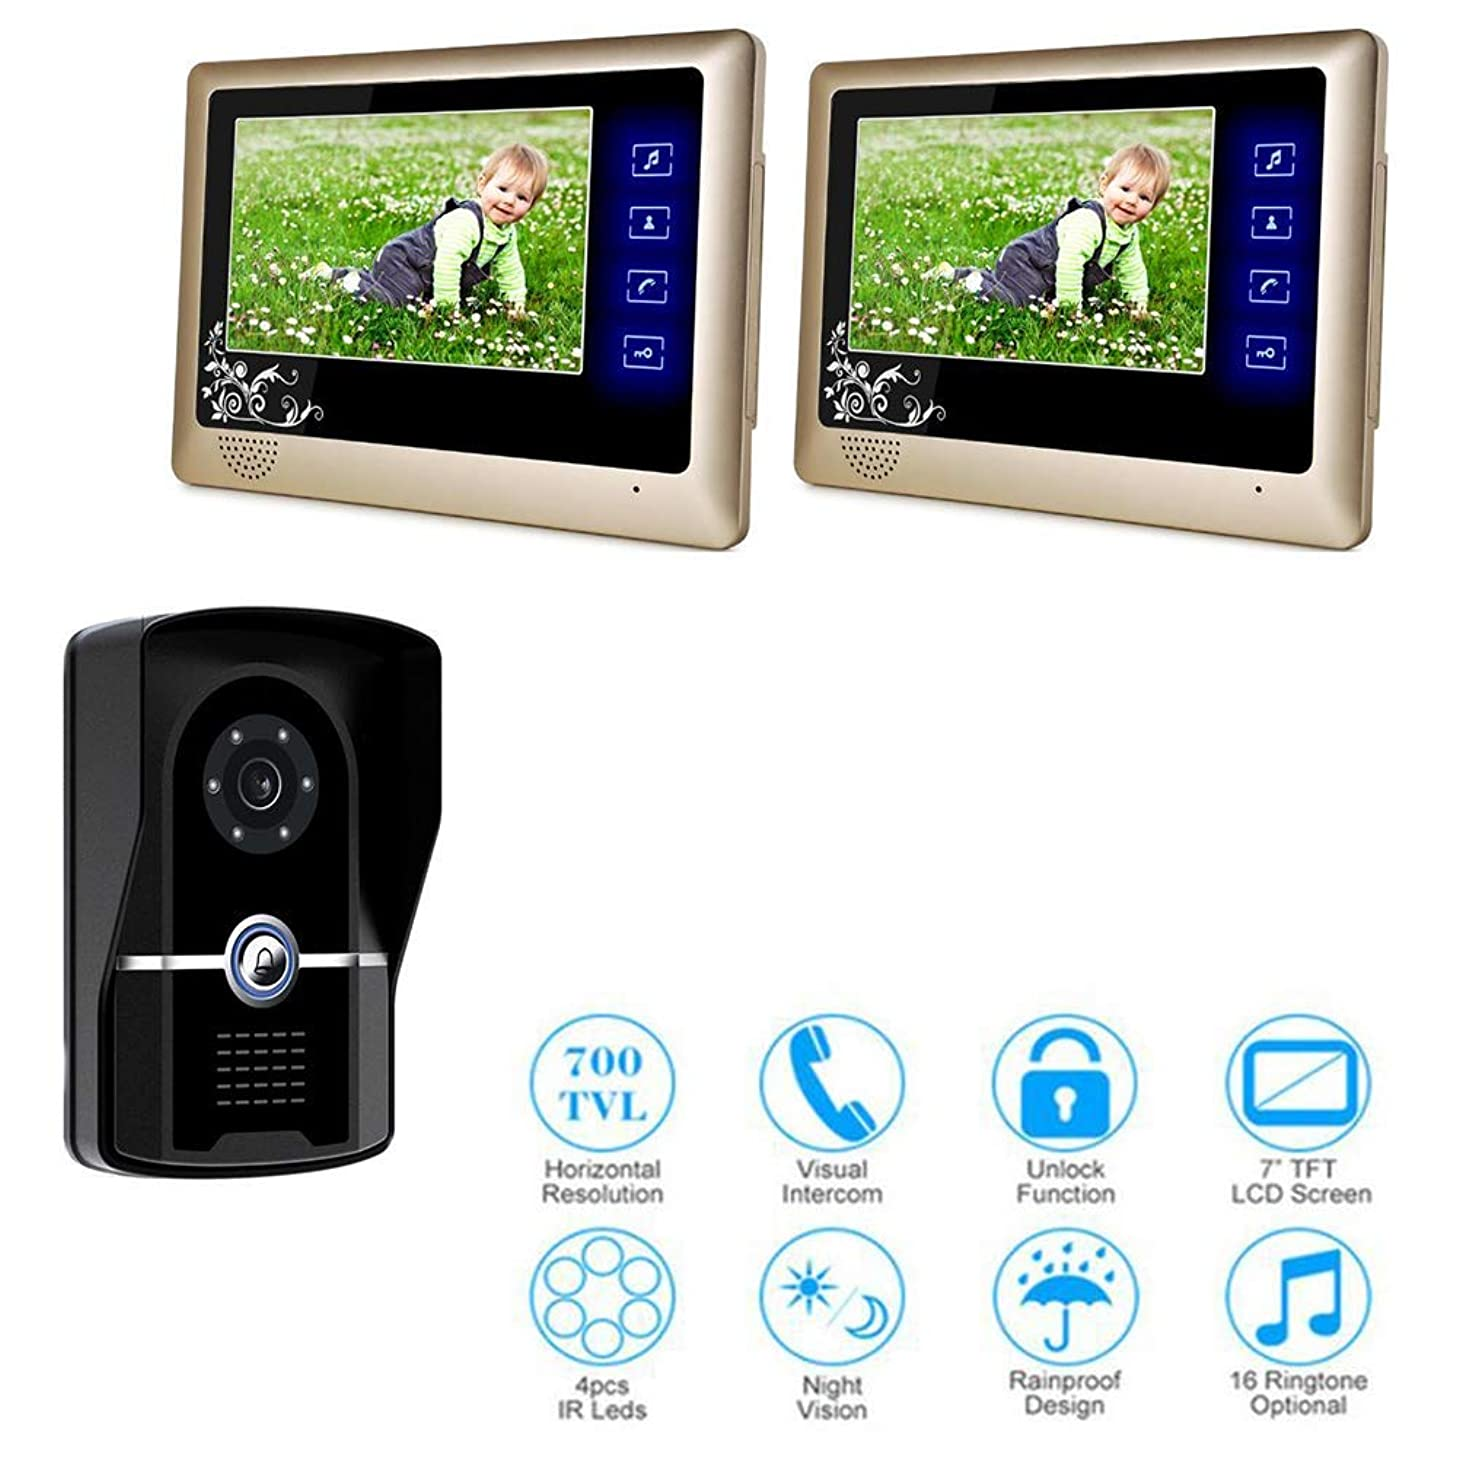 JINPENGPEN 7-inch Smart Video doorbell Remote intercom Access Control System HD Infrared Camera,1/2